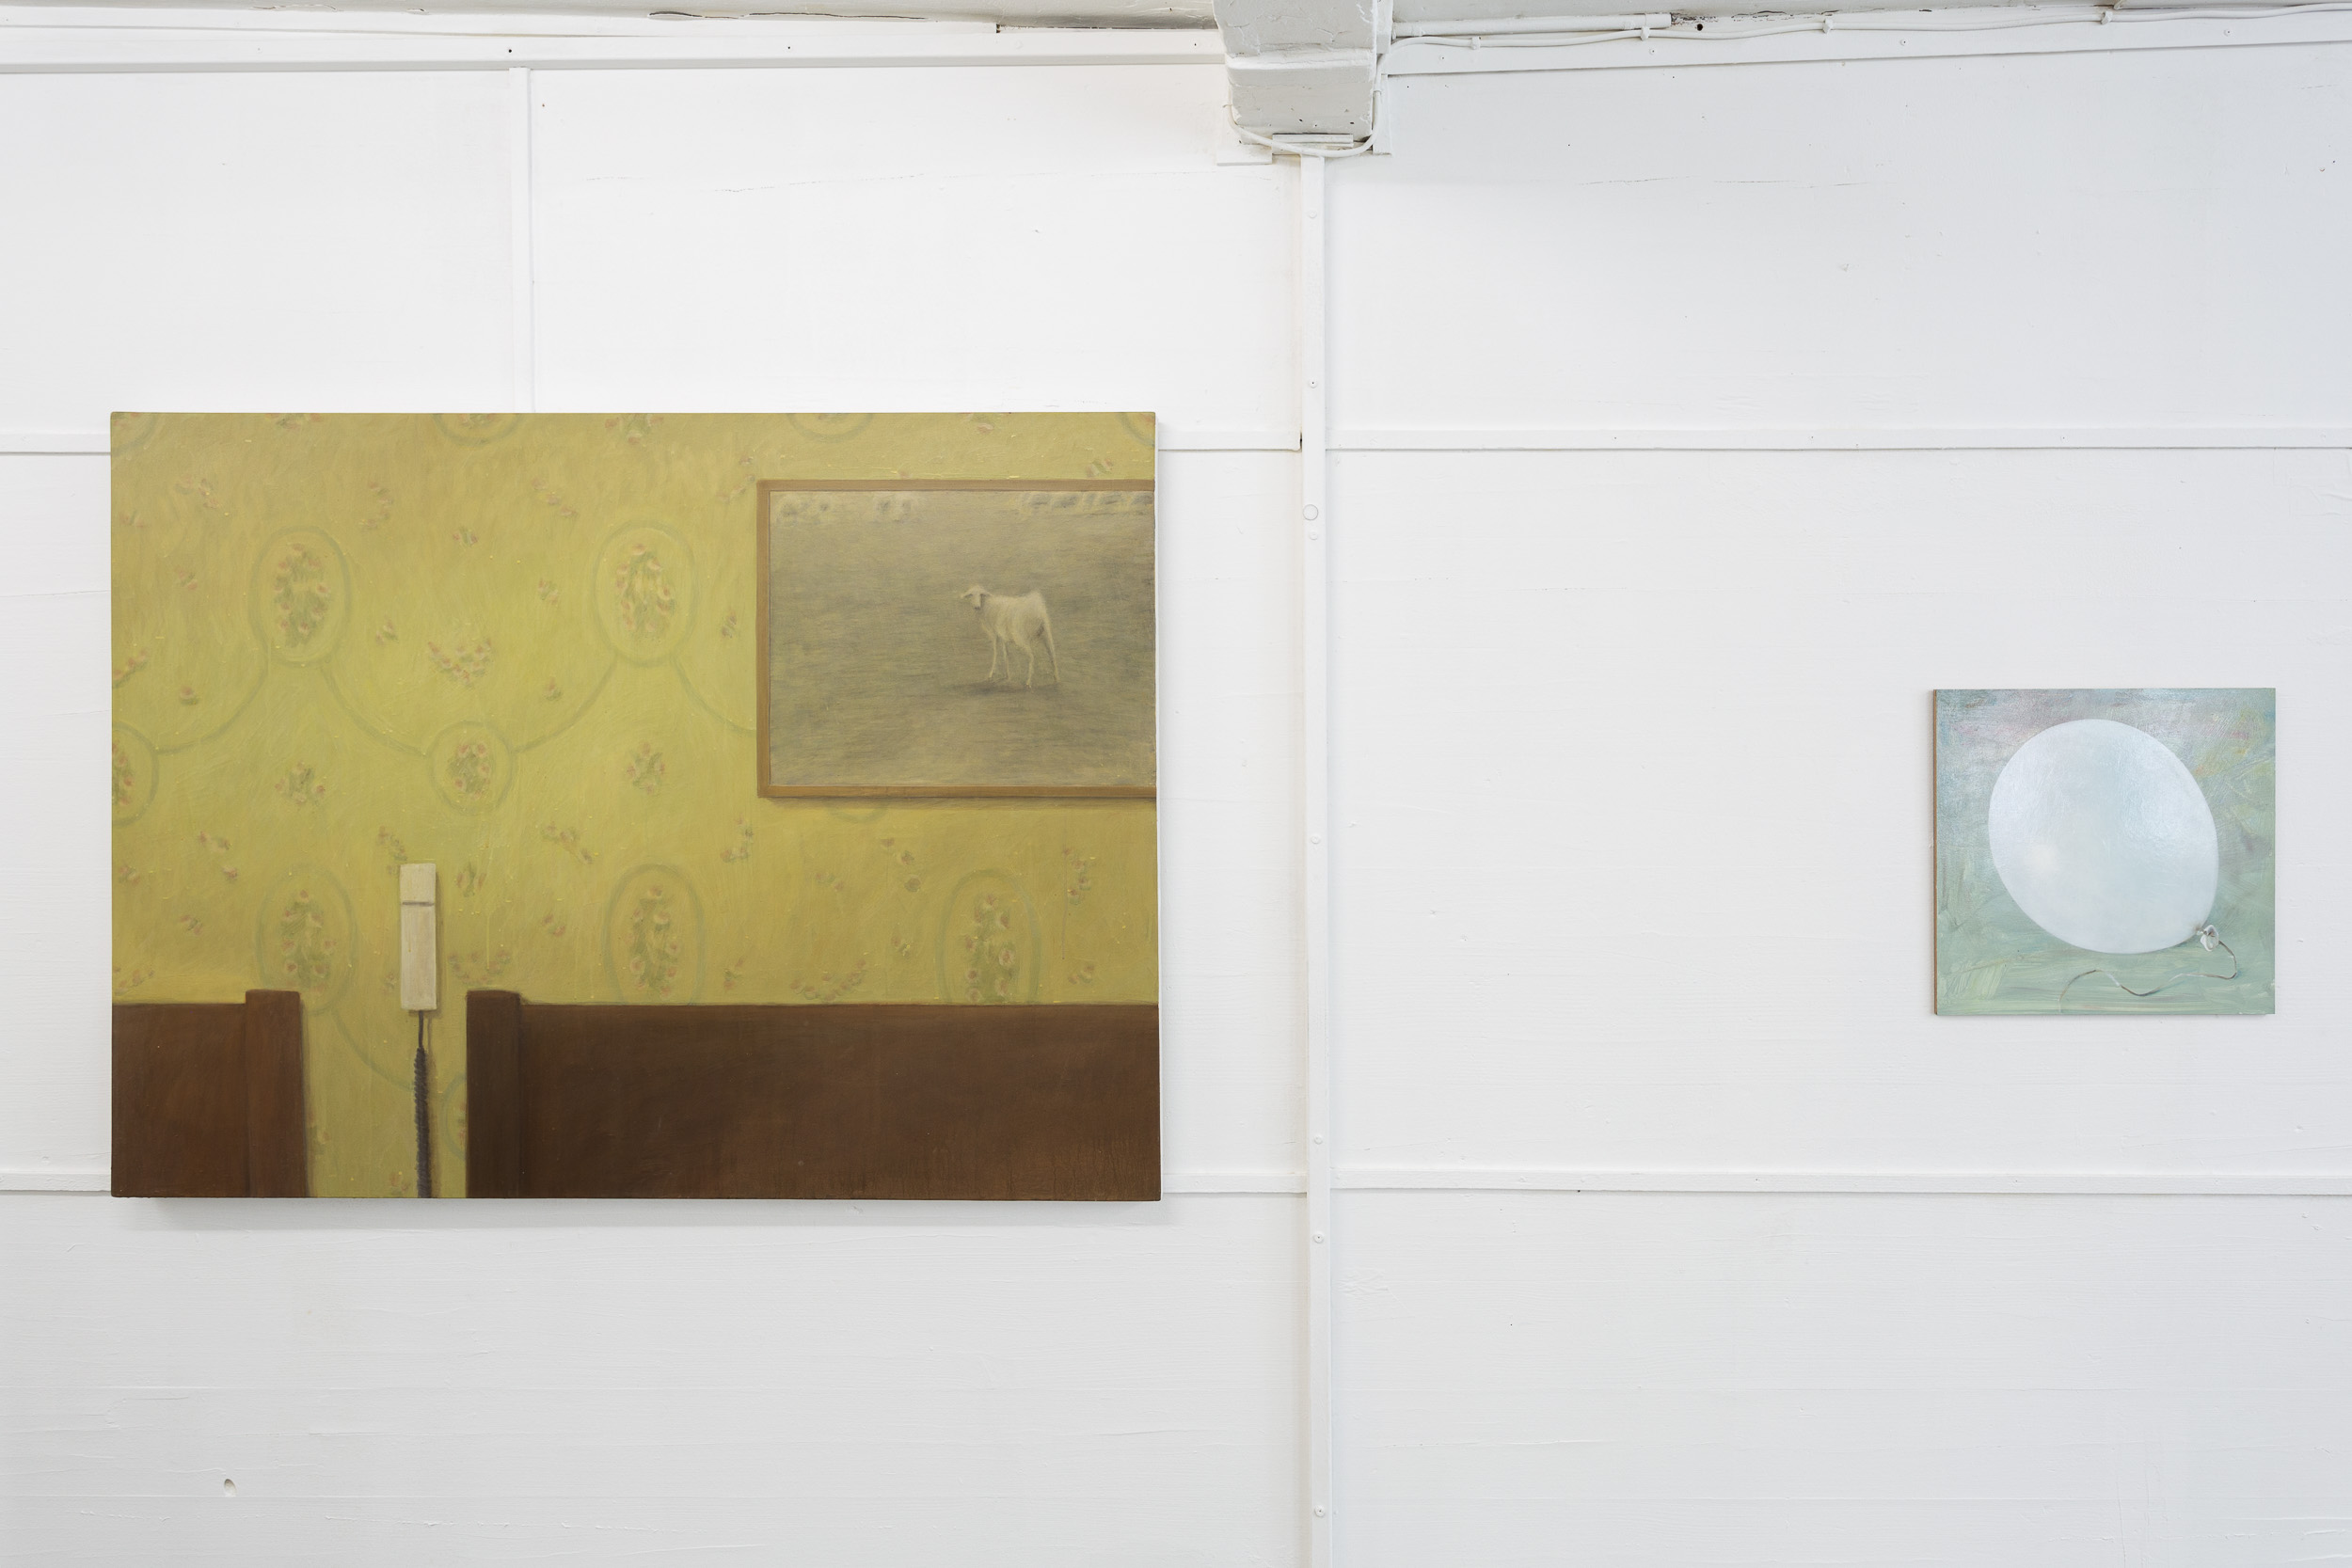 Left: Christoph Hänsli,  Interior , 2000, egg tempera and acrylic on canvas, 105 x 140 cm  Right: Francisco Sierra,  Untitled (White Baloon) , 2017, oil on wood, 44 x 45 cm  Photo: Kilian Bannwart